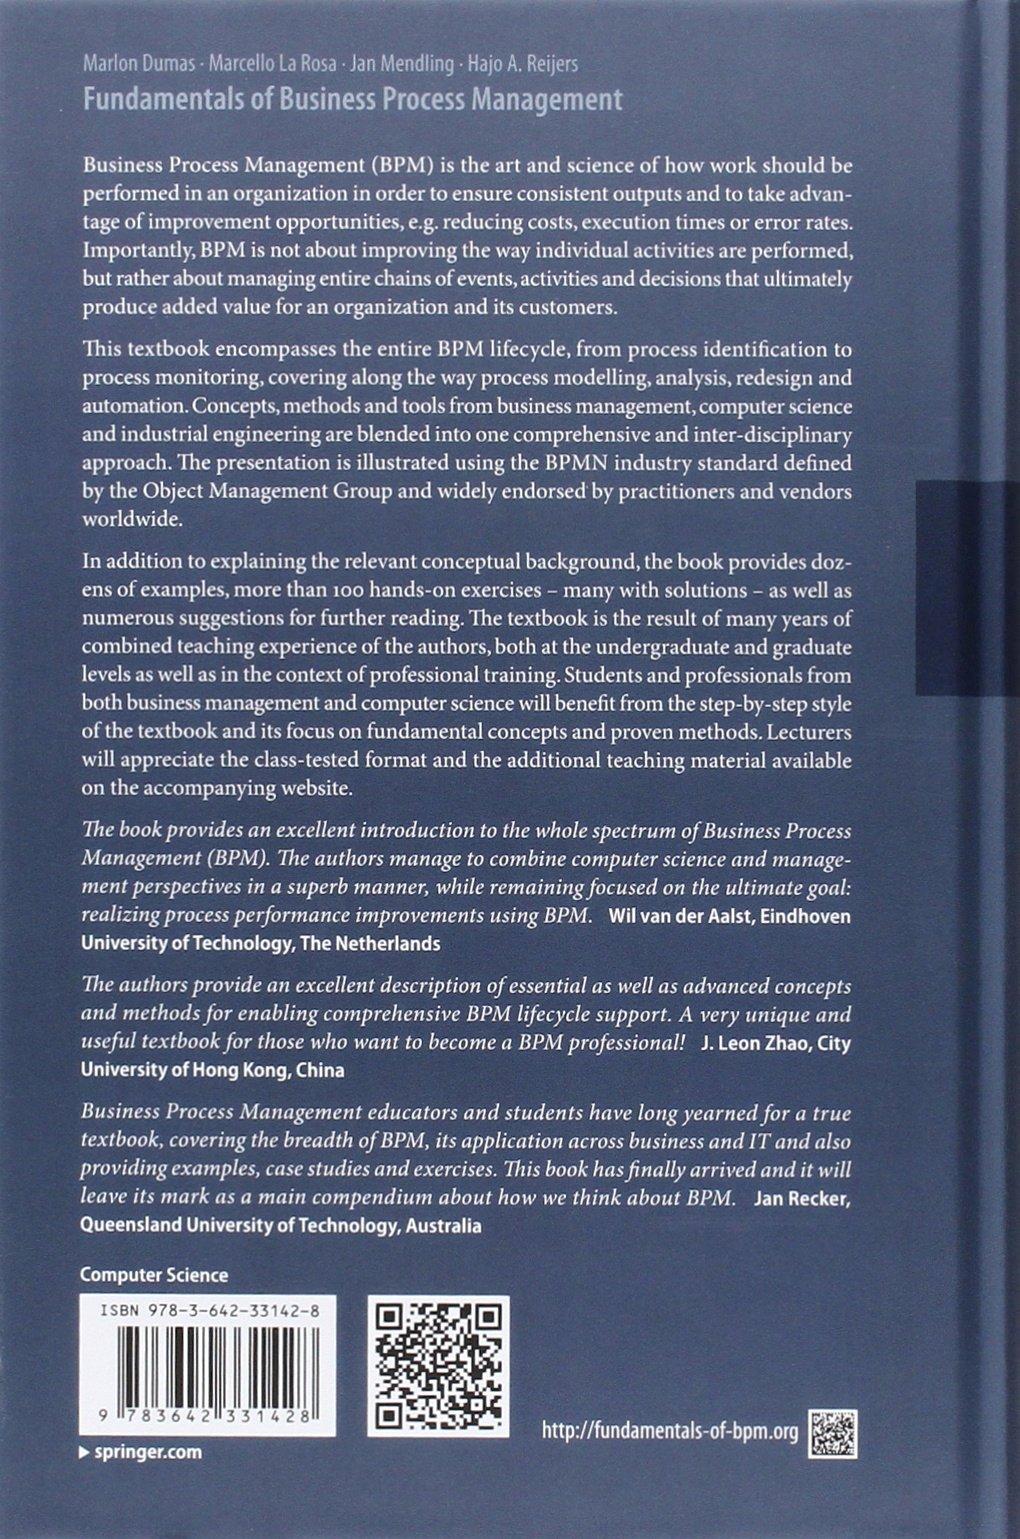 Fundamentals of Business Process Management: Amazon.de: Marlon Dumas ...